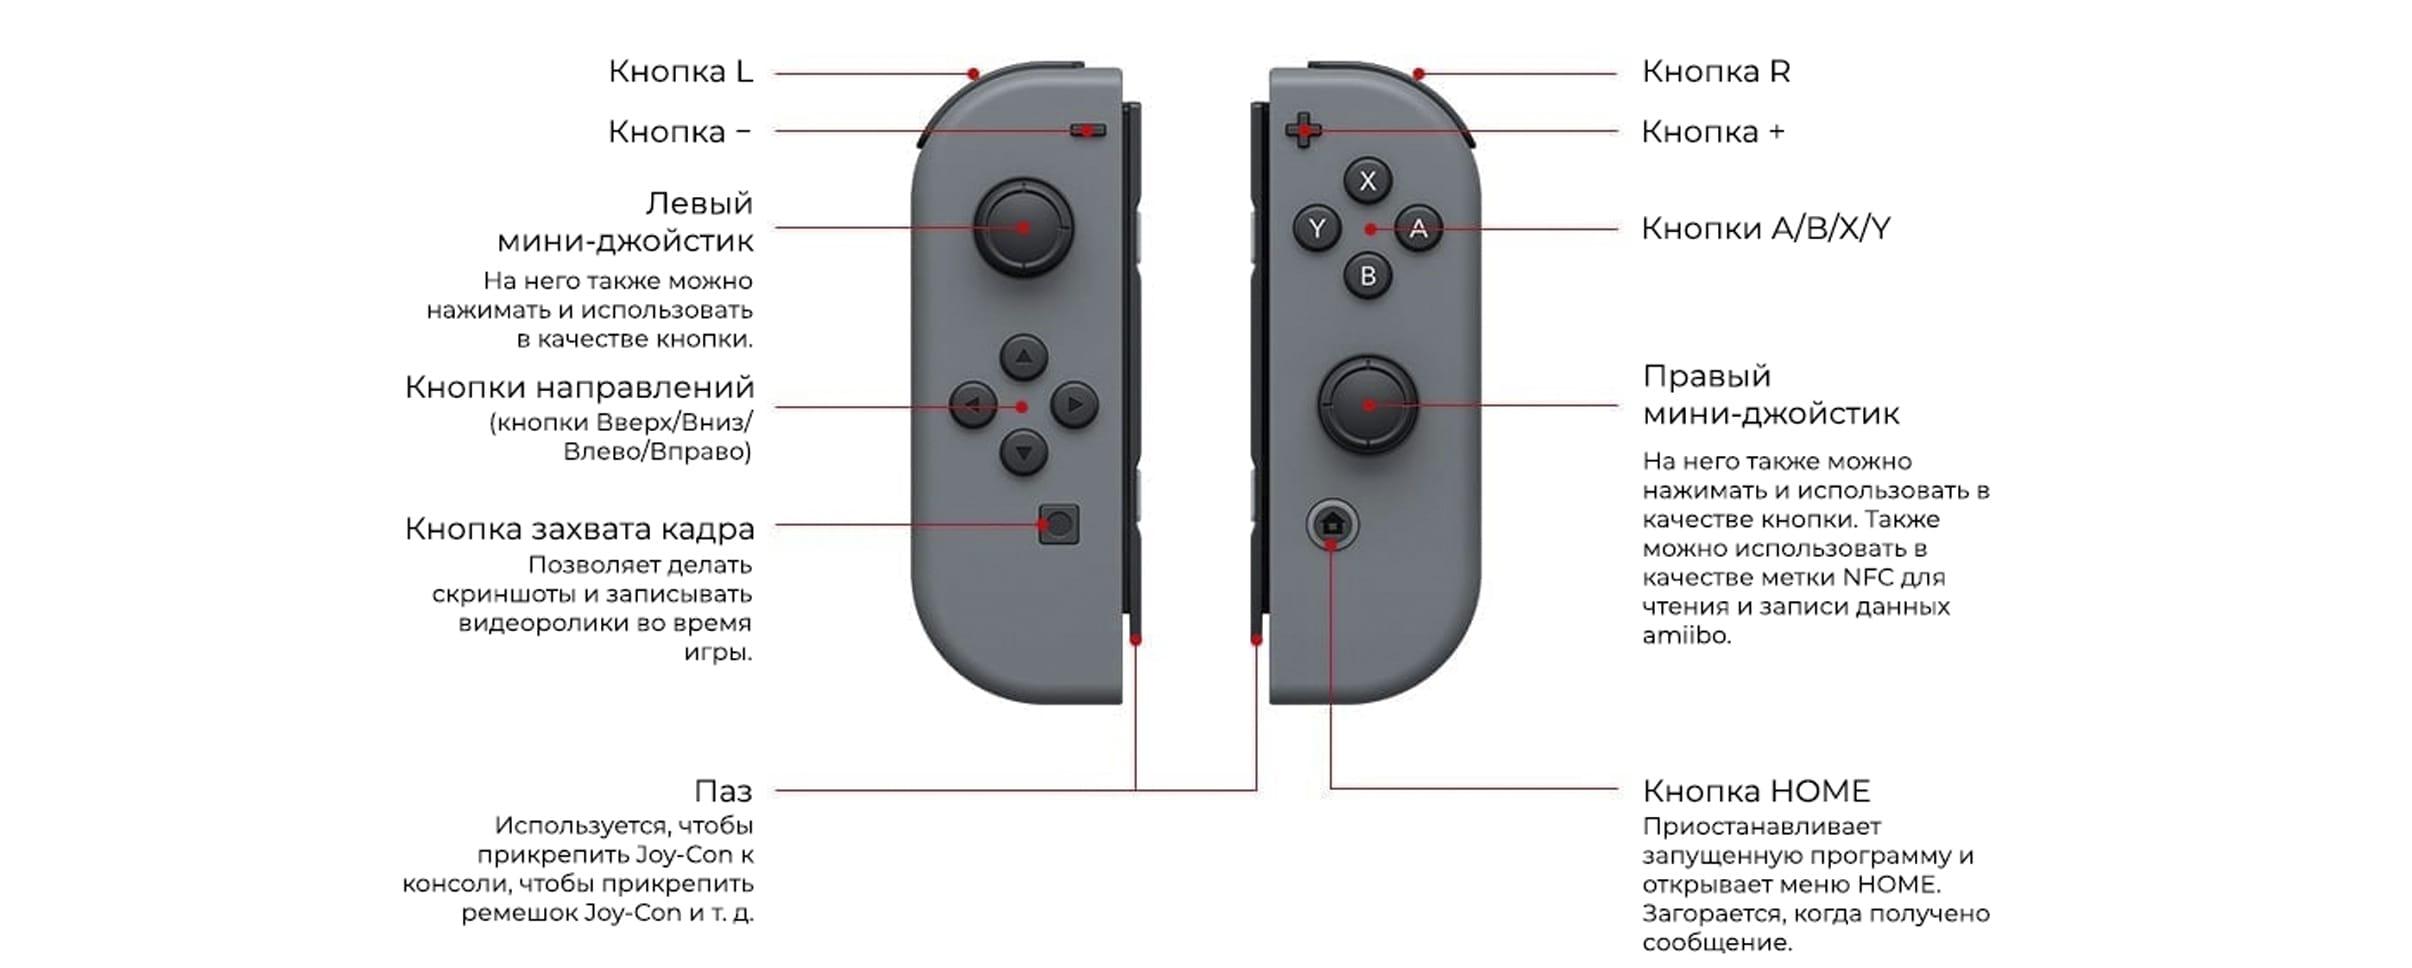 Контроллеры Nintendo Switch, вид спереди